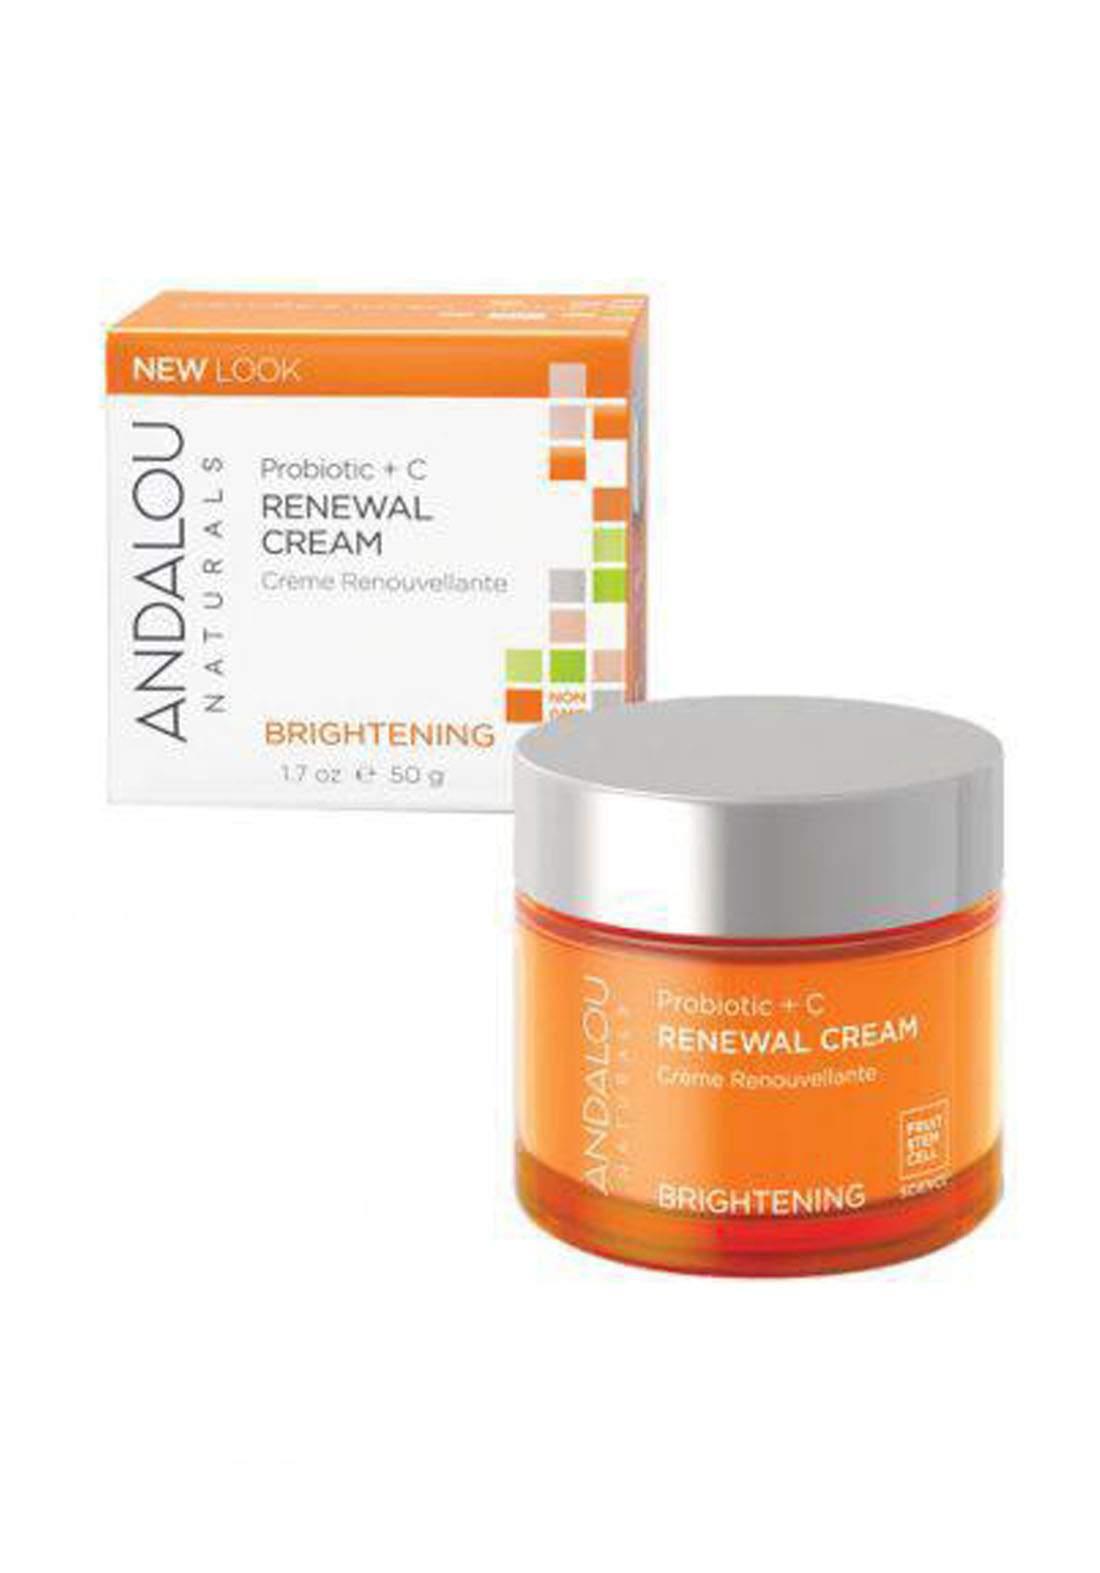 Andalou 2300 Naturals Renewal Cream Brightening Probiotic + C 50 g كريم تفتيح للوجه